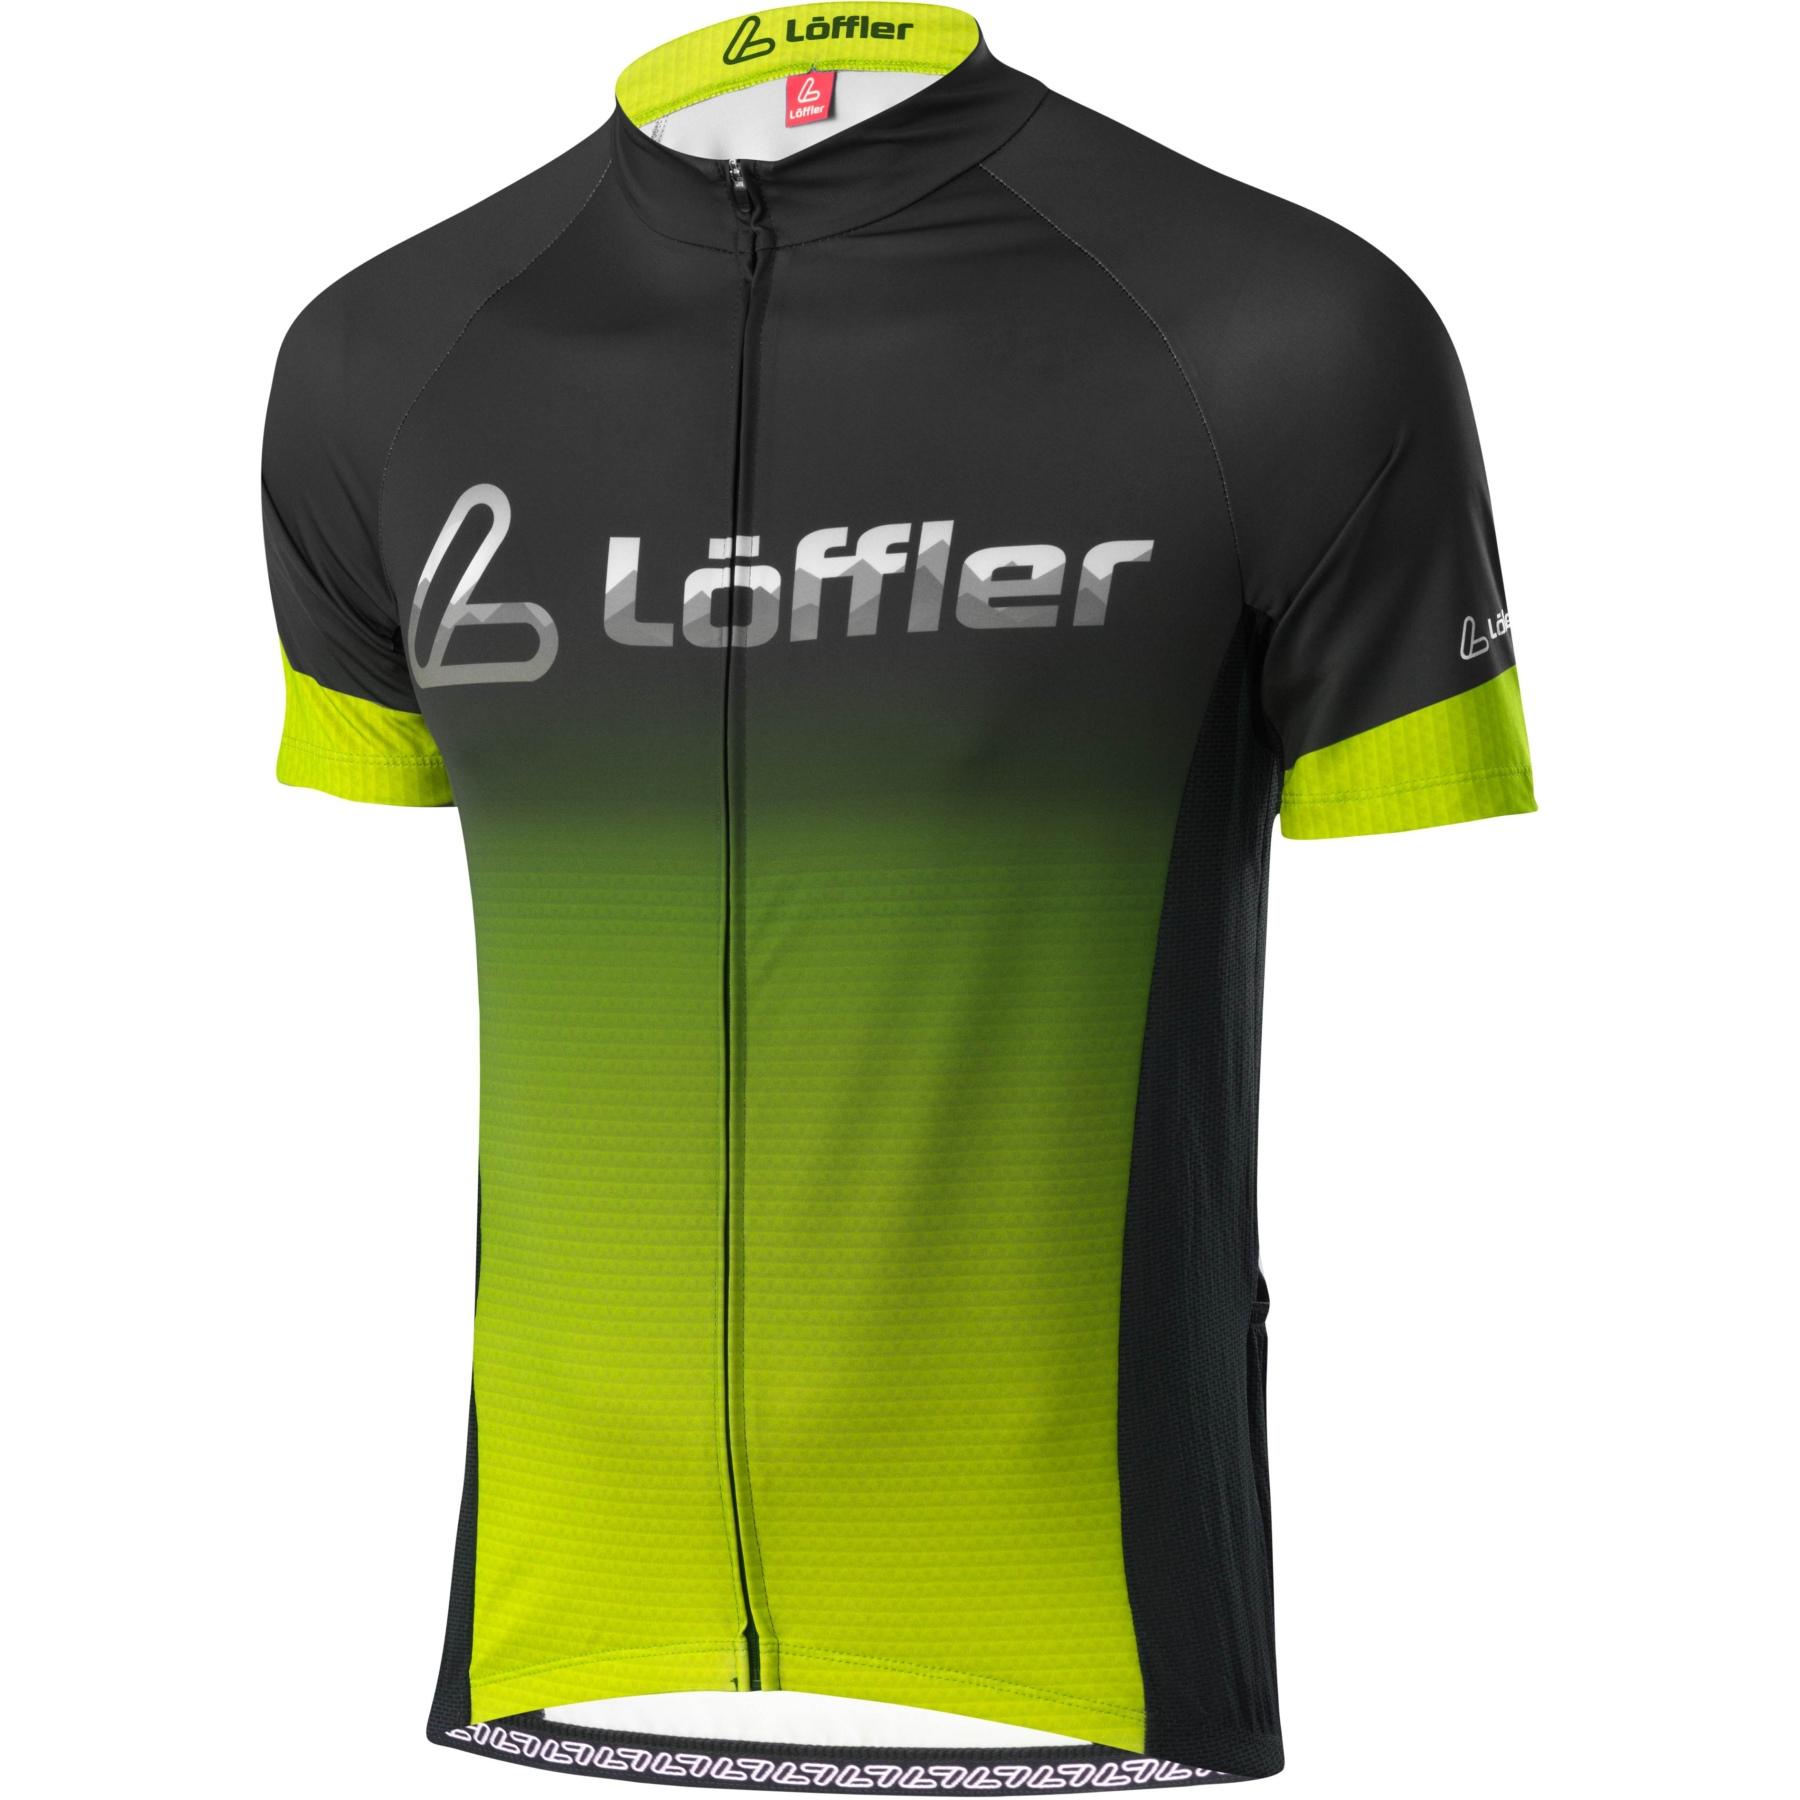 Löffler Bike Trikot FZ Messenger Mid 24602 - black/light green 993